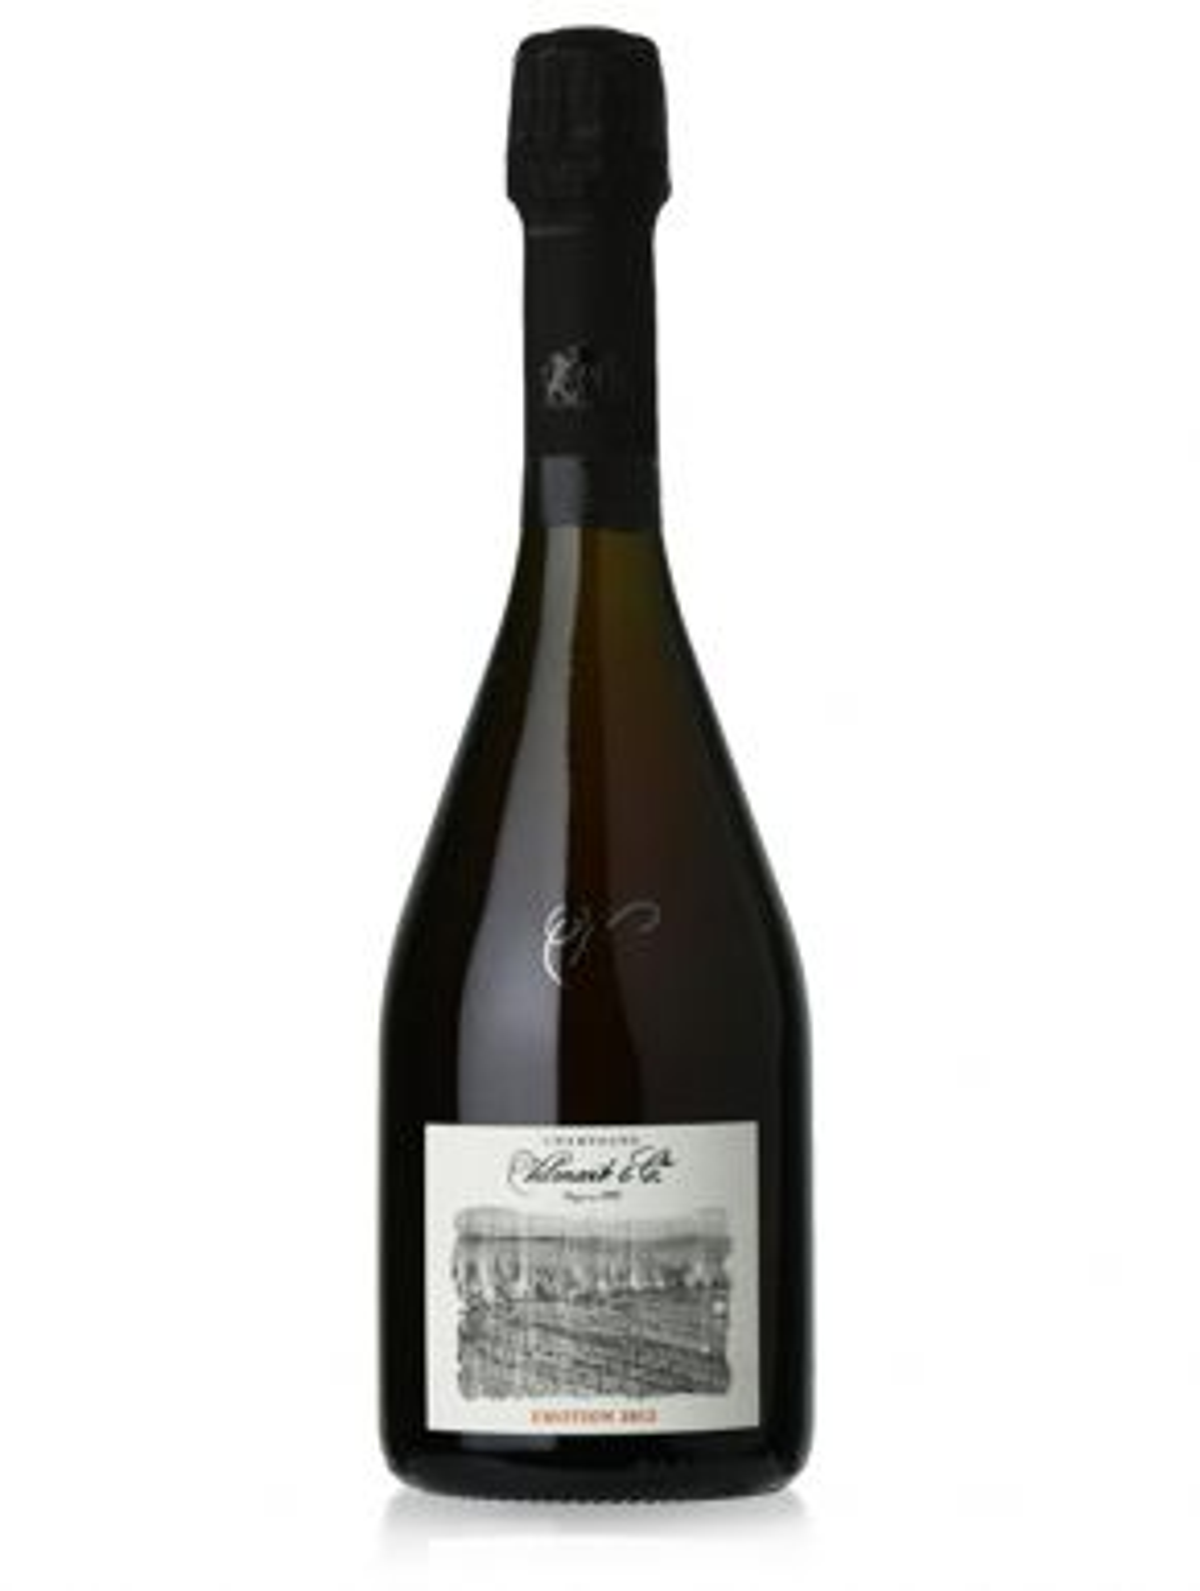 Vilmart et Cie 'Emotion' 2012 Vintage Rosé Champagne 75cl